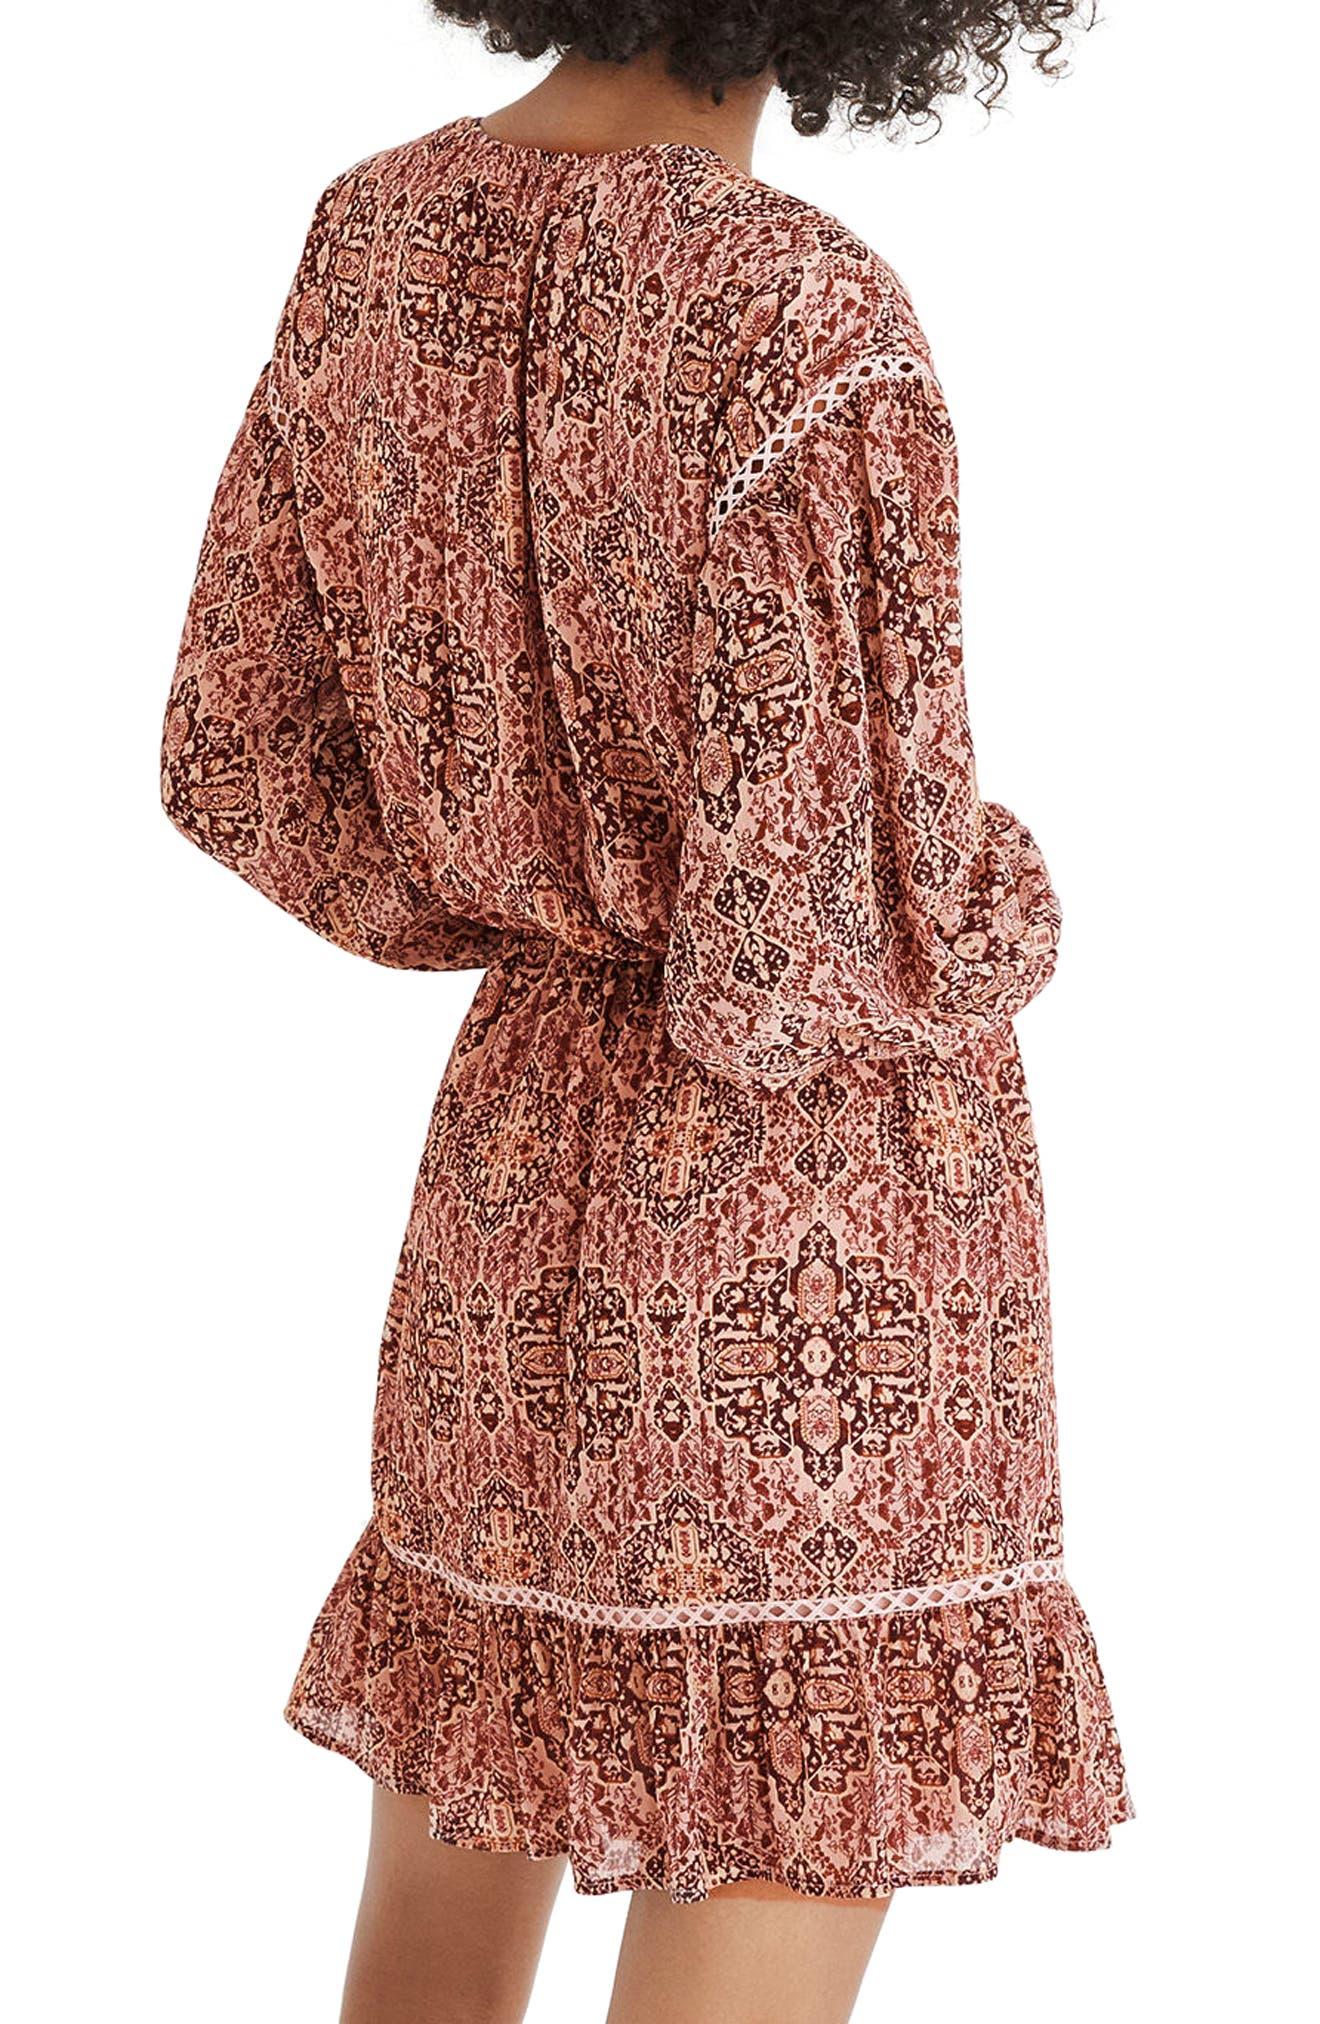 Drawstring Peasant Dress,                             Alternate thumbnail 2, color,                             650